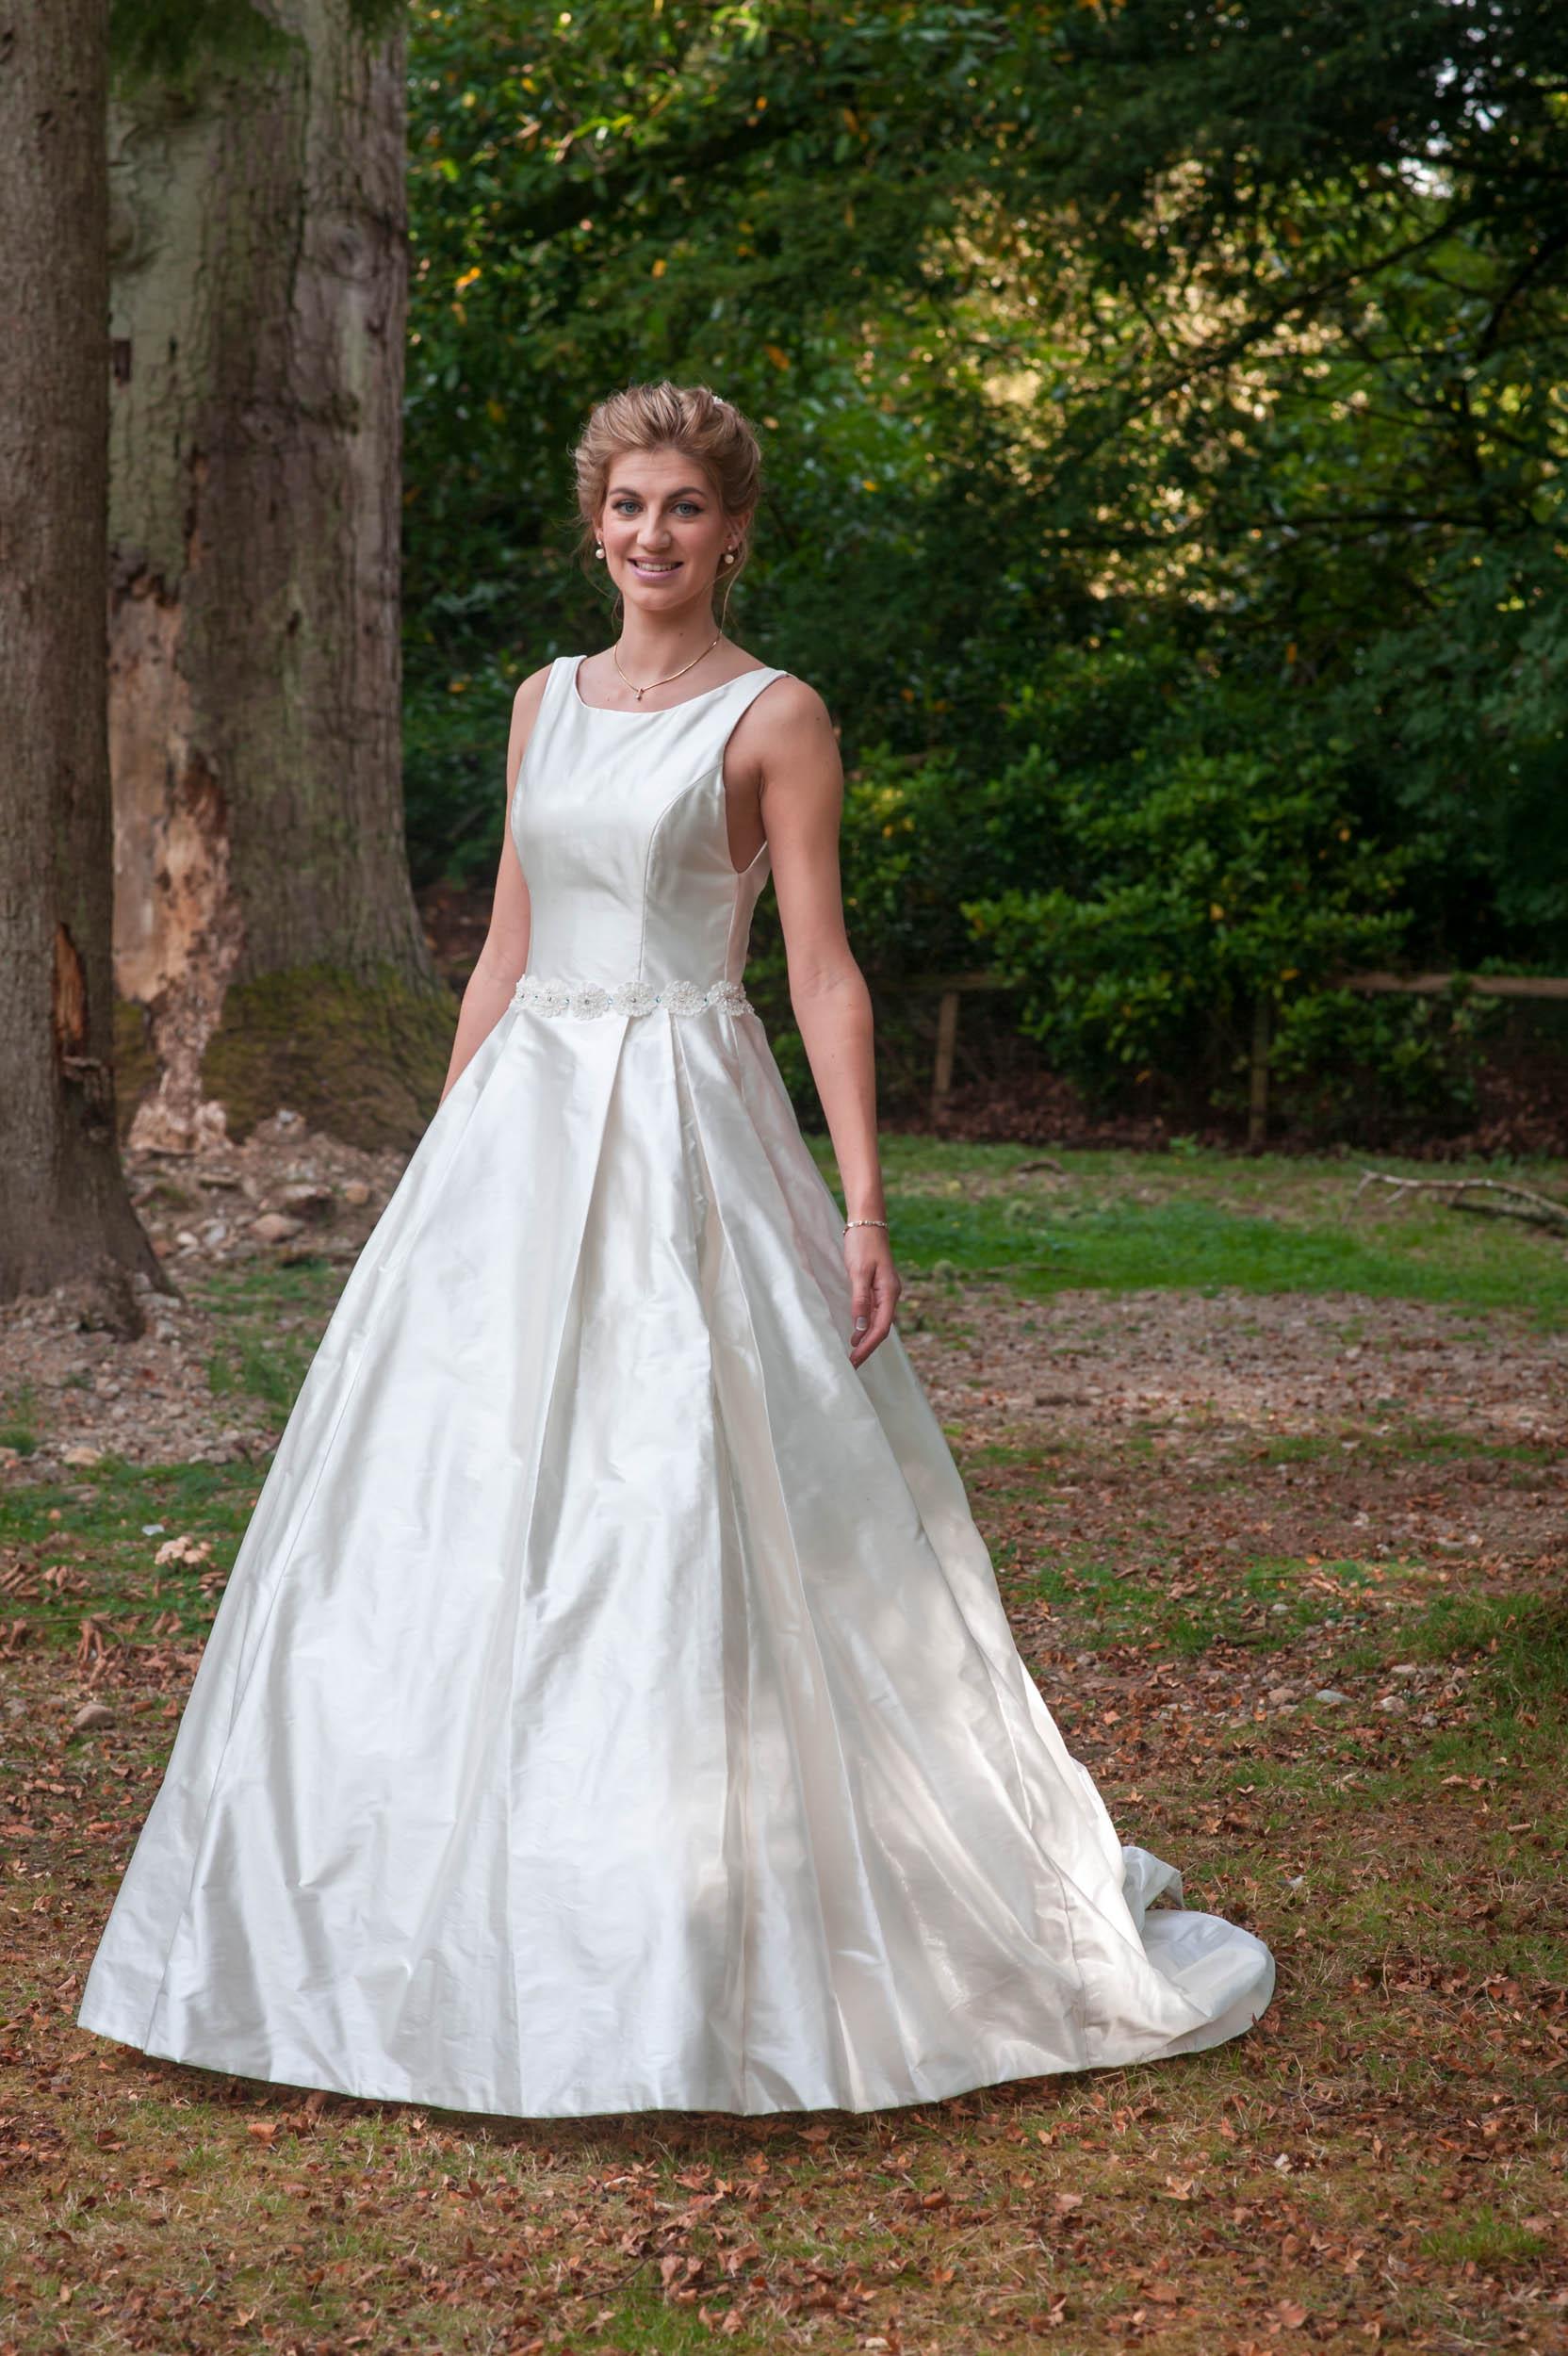 Bride-0339.jpg